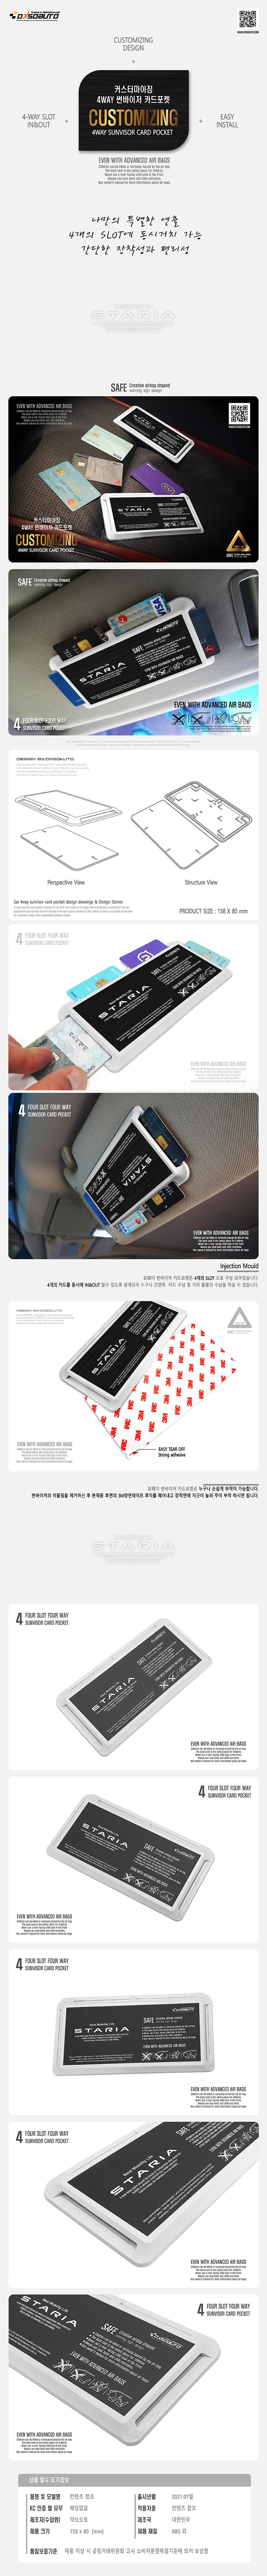 [DXSOAUTO] 커스터마이징 4WAY 썬바이저 카드포켓 (1EA / 1SET) 스타리아 화이트